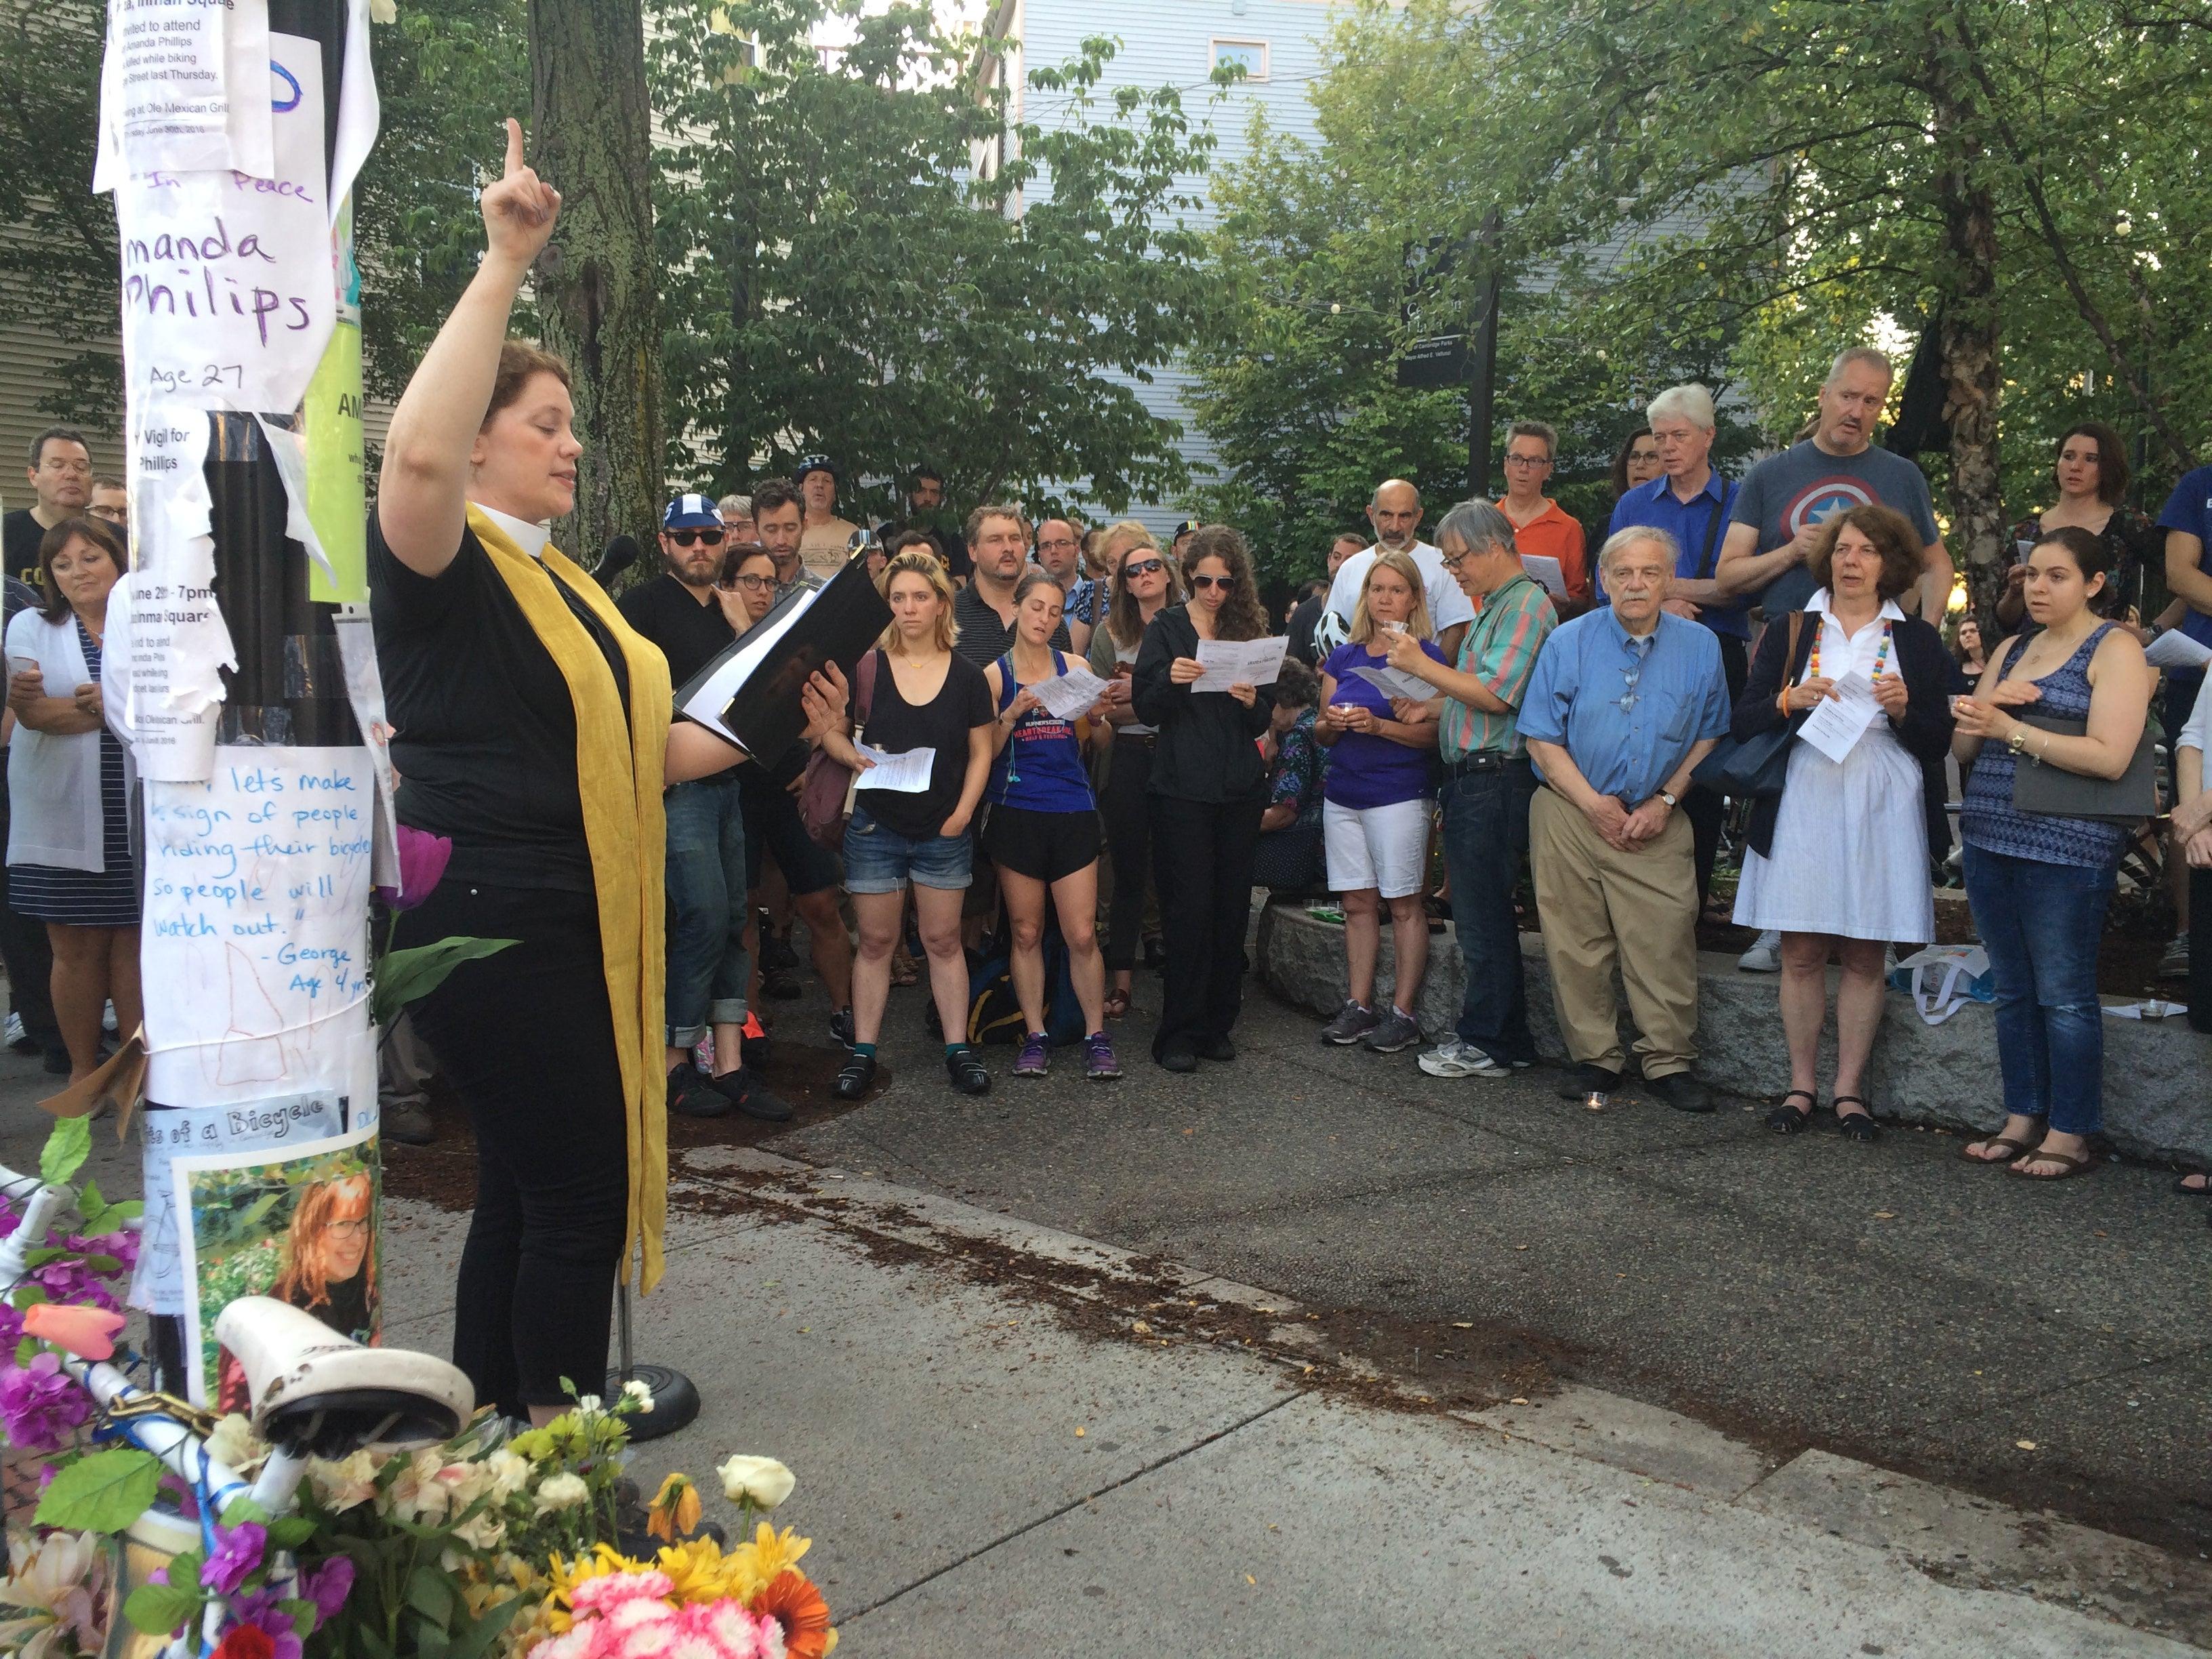 Laura Everrett leads the memorial service for Amanda Phillips.